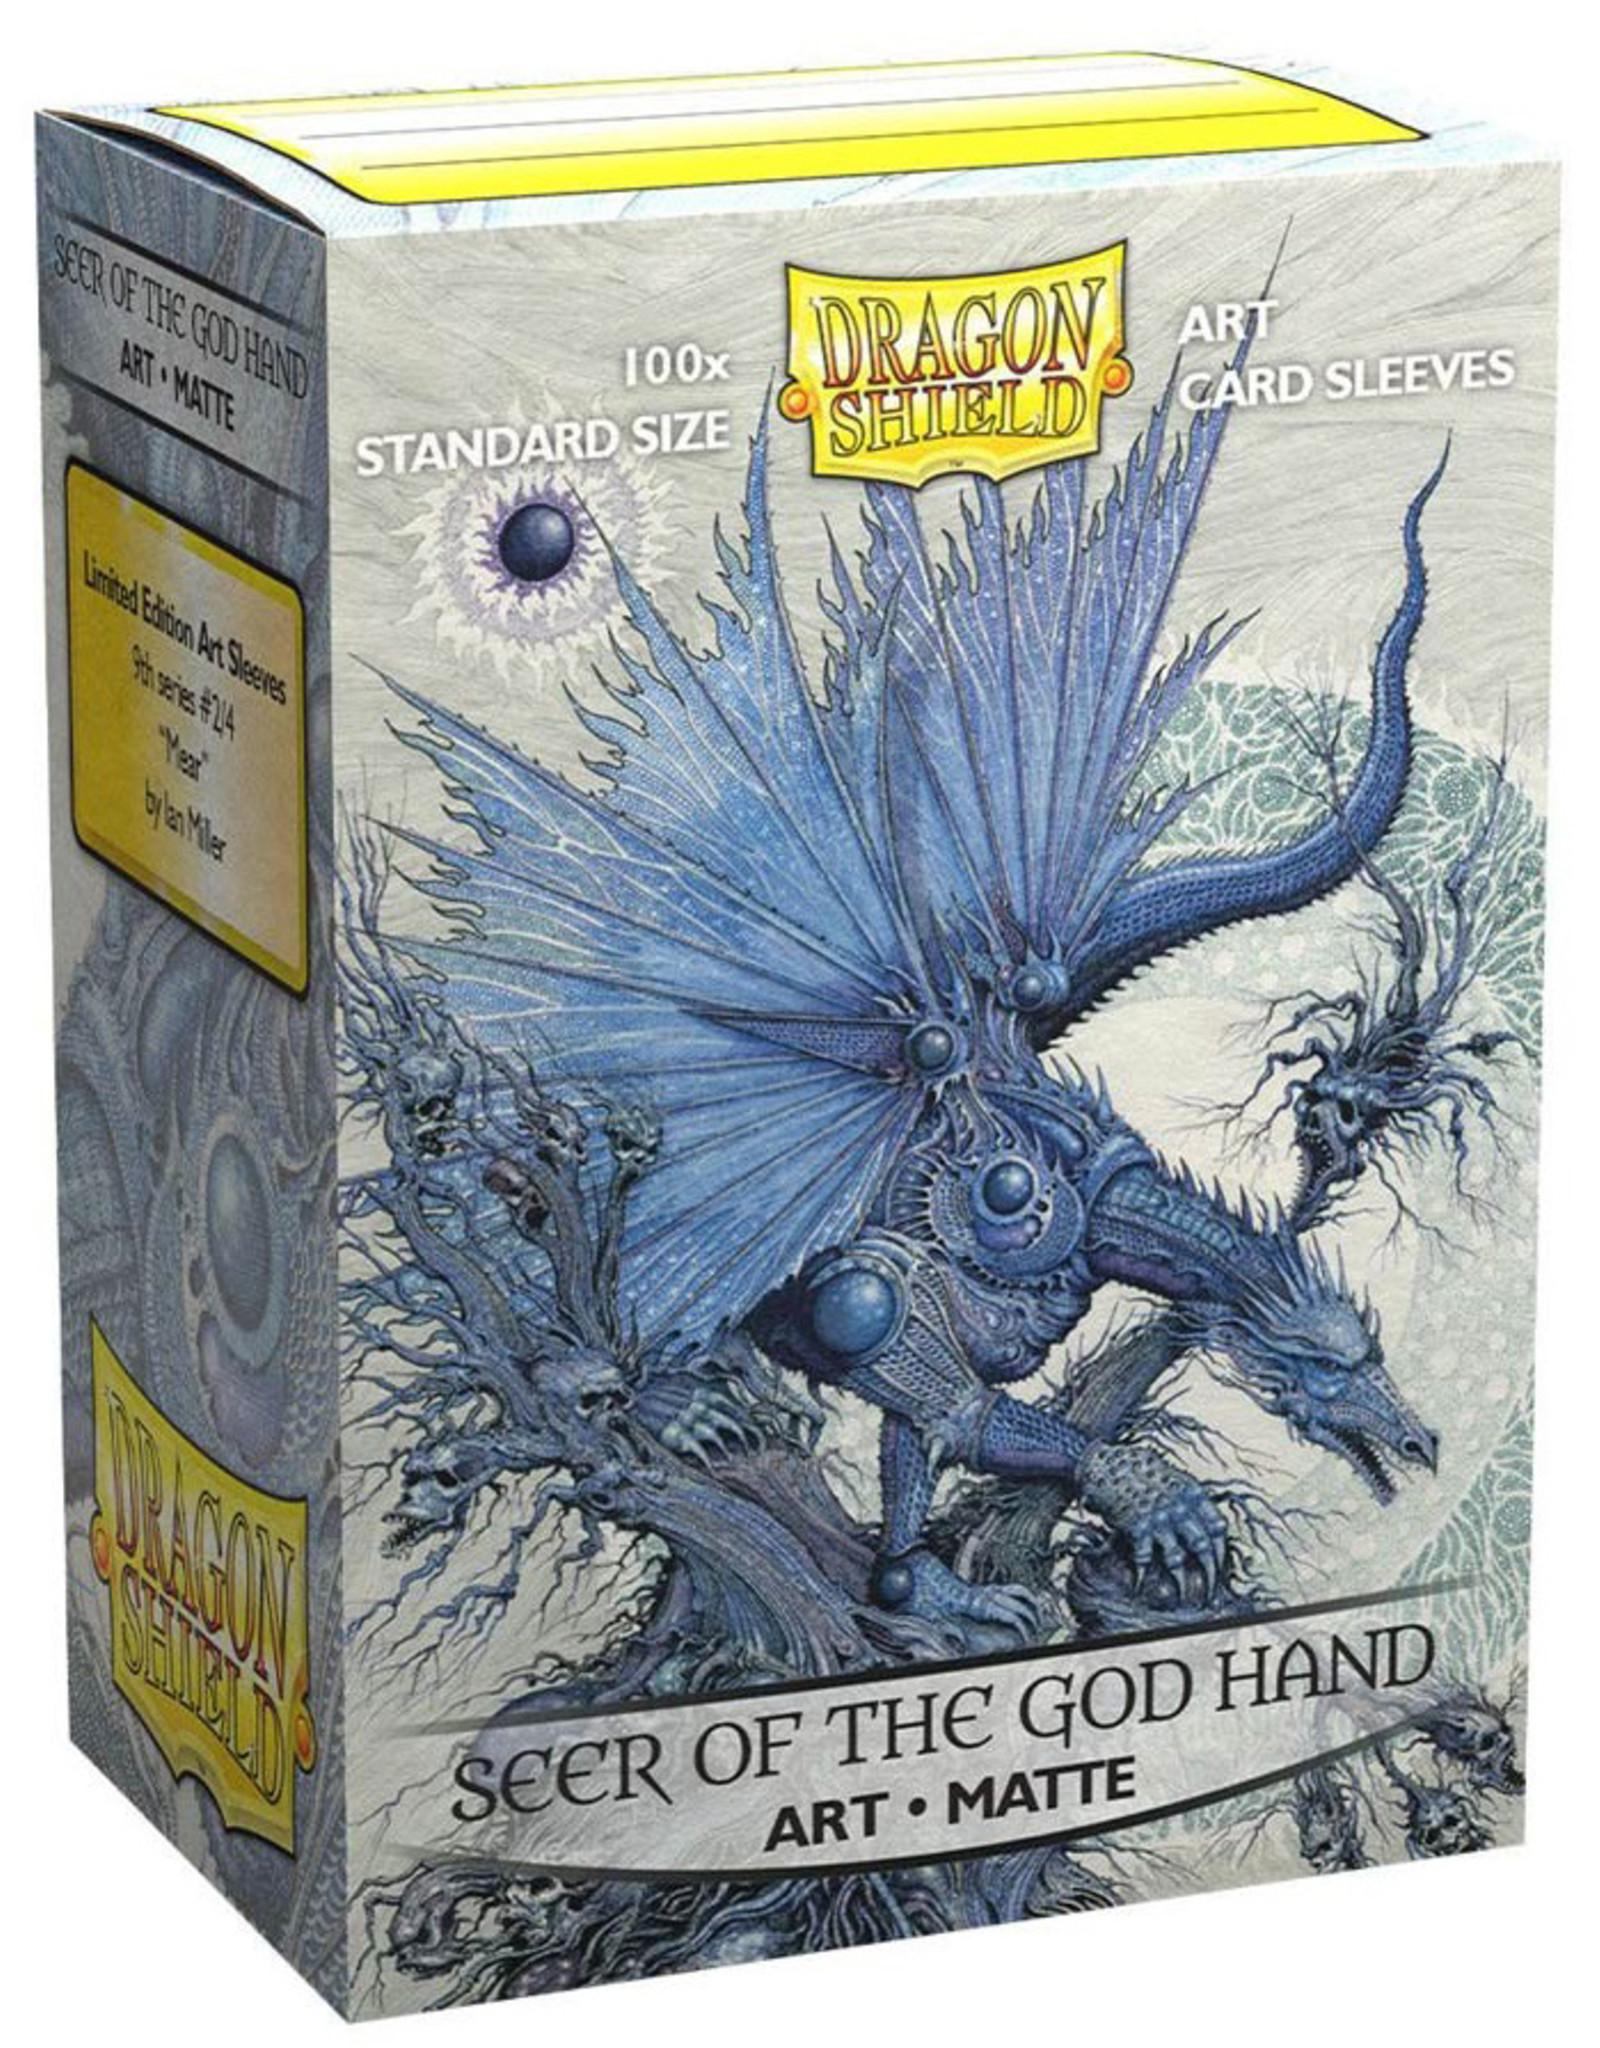 Dragon Shield: Art: Matte Seer o/t GodHand (100)